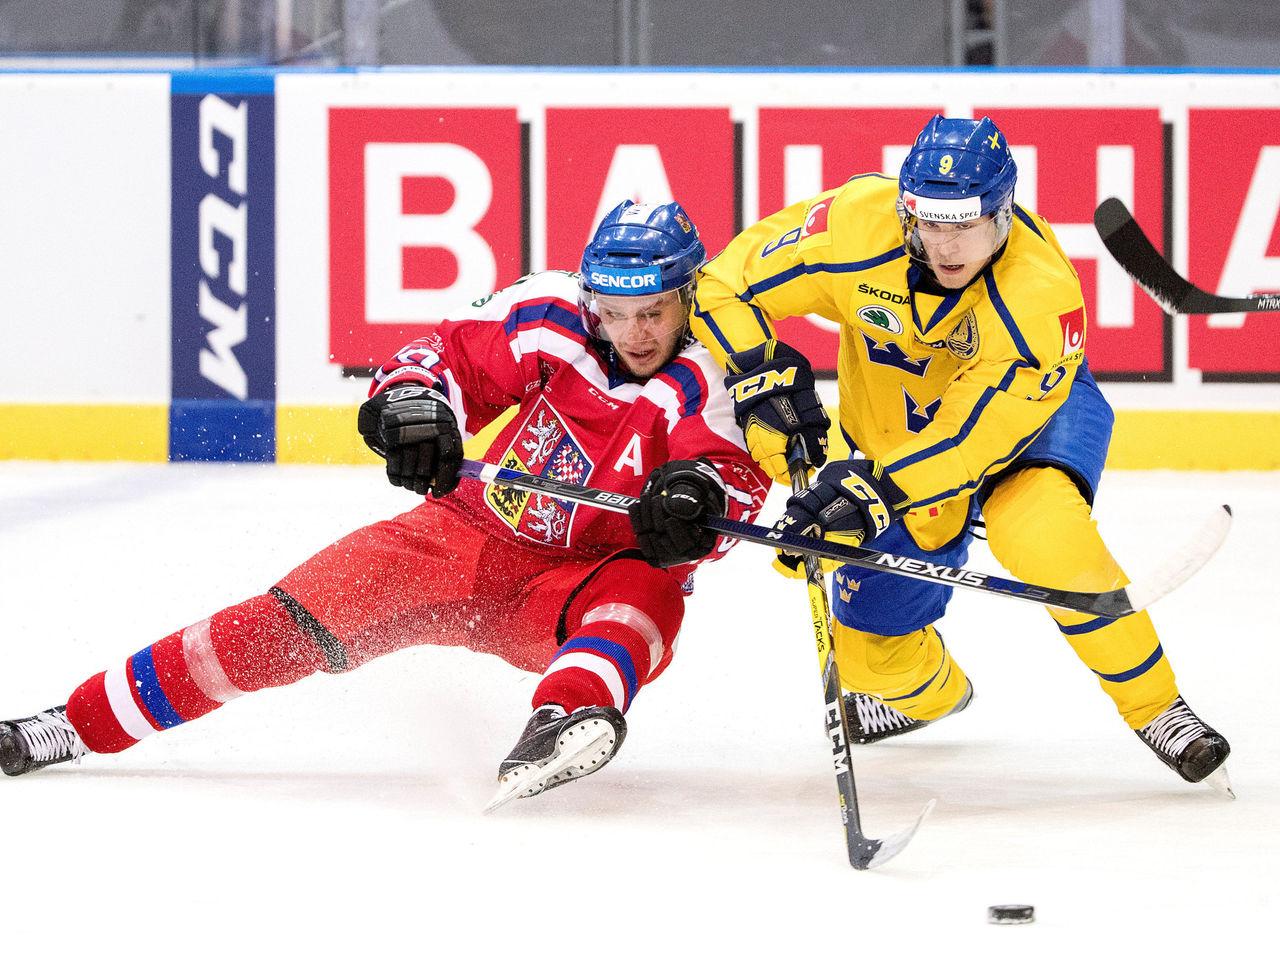 Cropped 2017 02 09t195909z 16548322 rc12f33700f0 rtrmadp 3 sweden hockey games cze swe